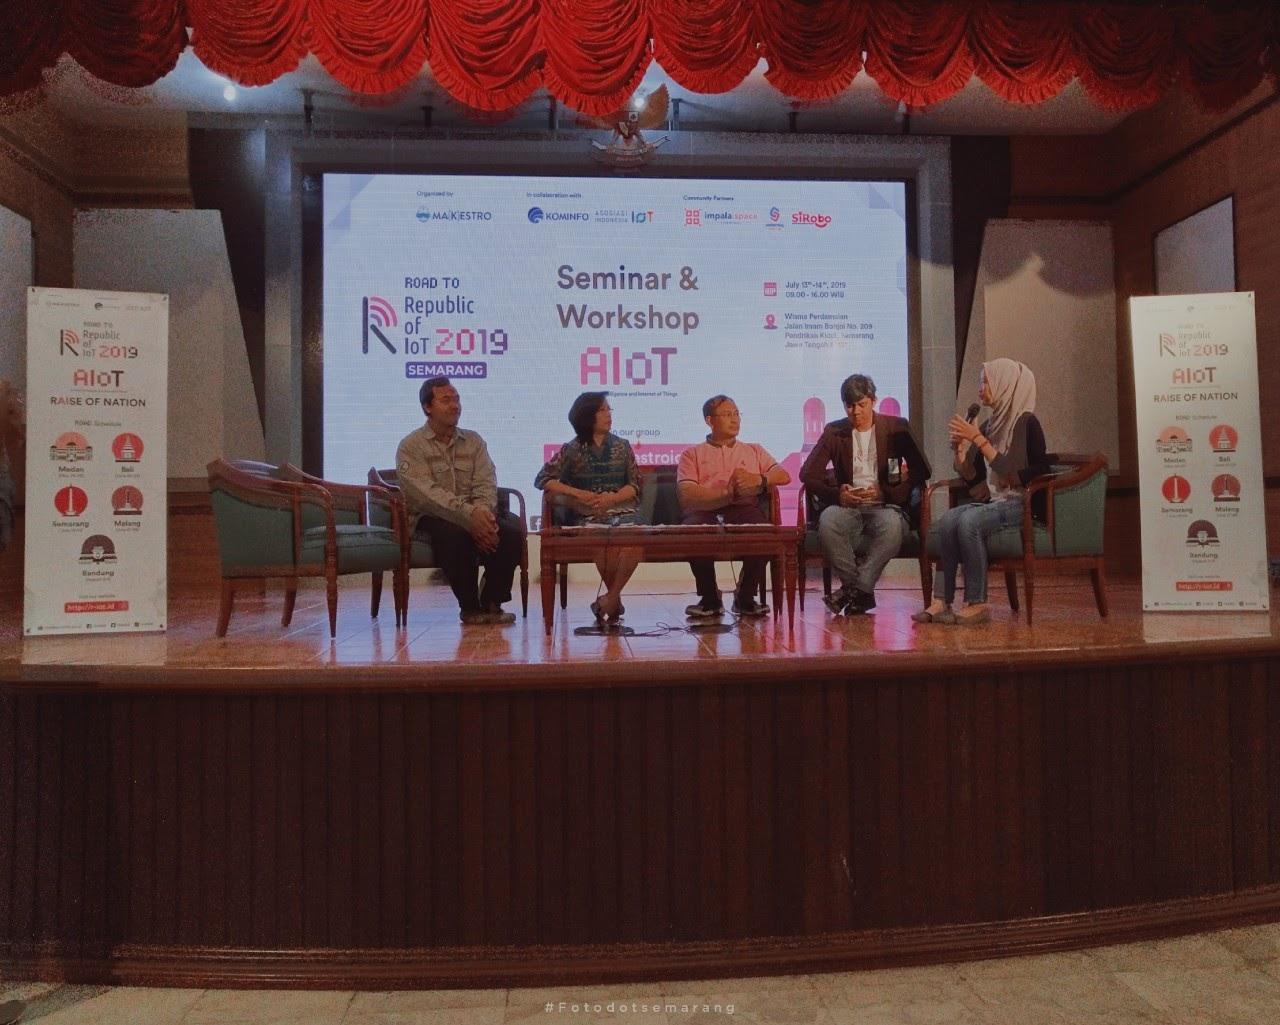 [Review Event] Road To Republic IoT 2019 Kota Semarang